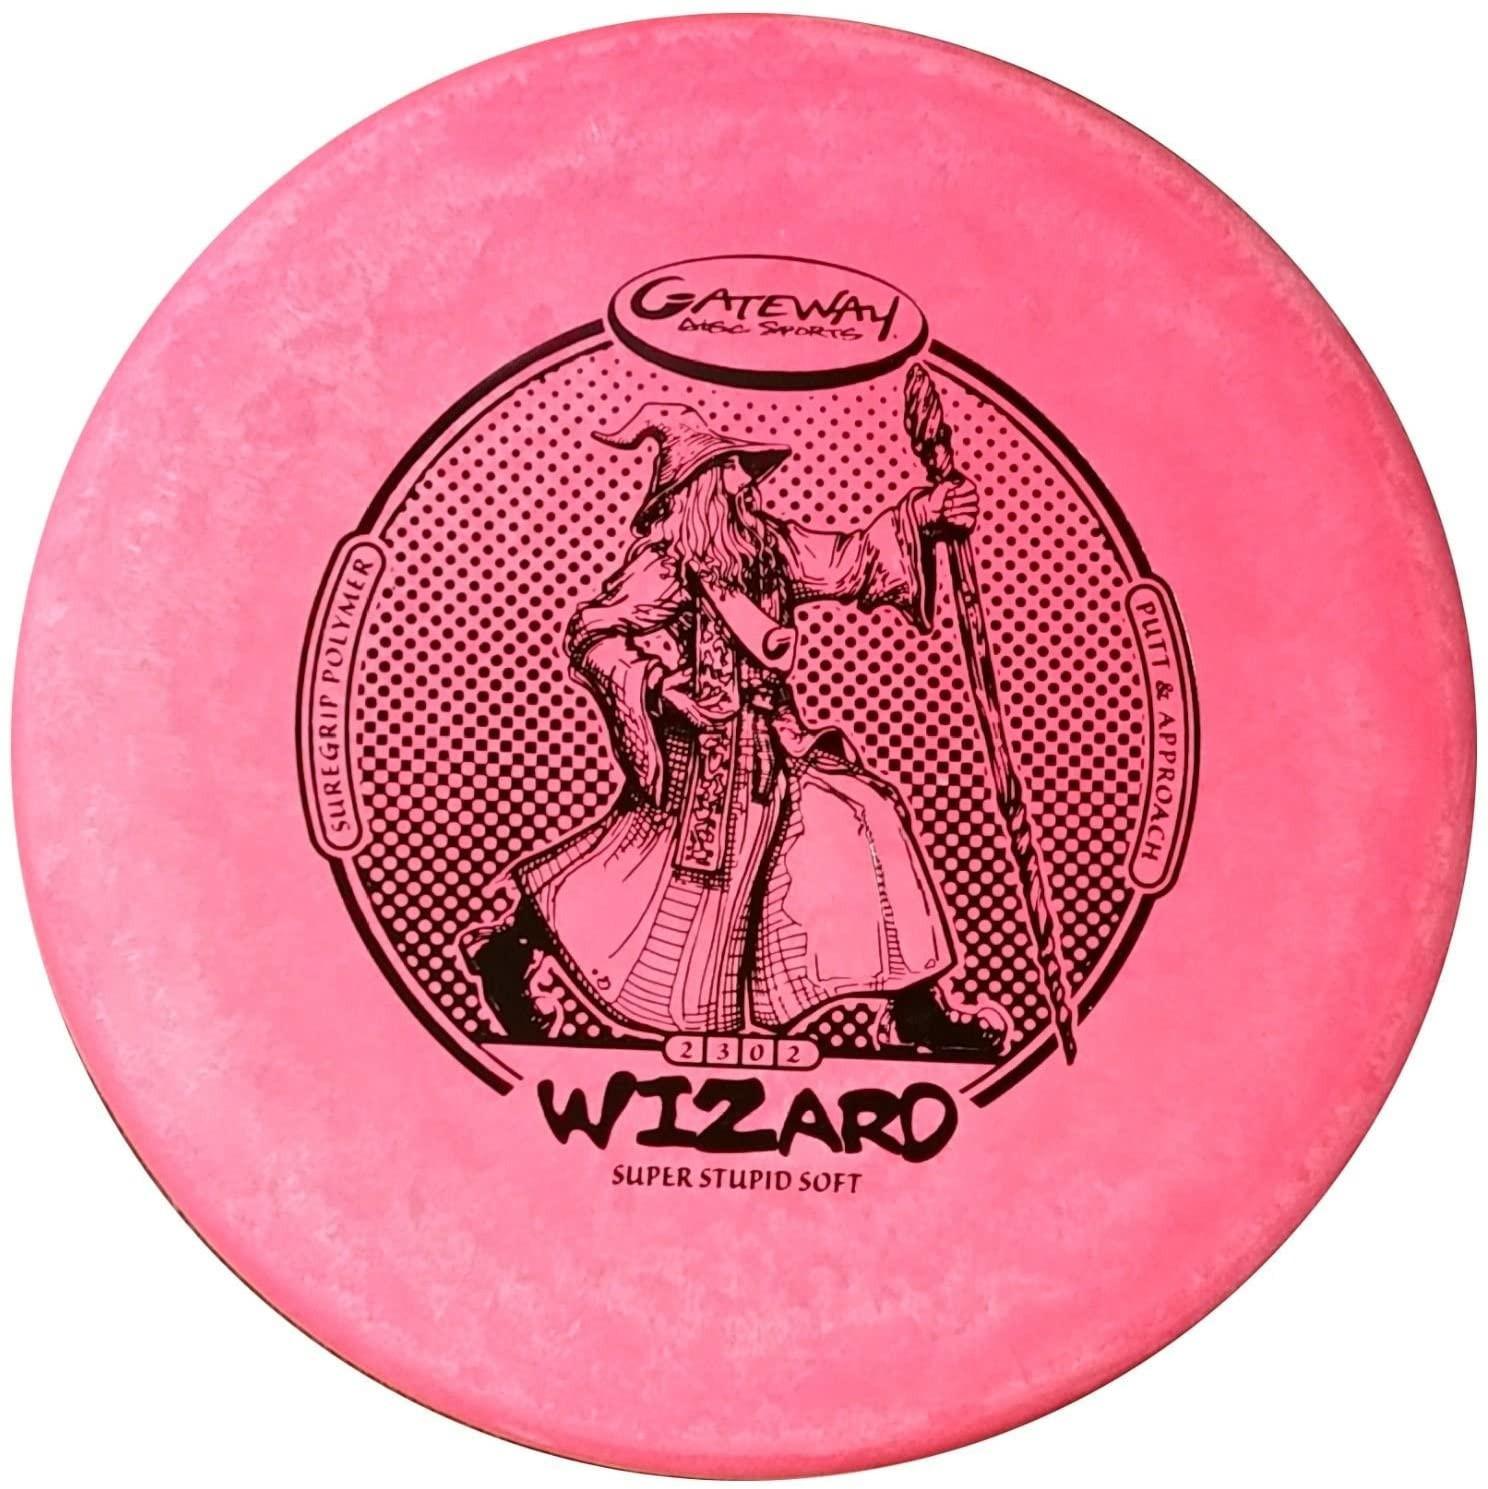 Gateway Wizard